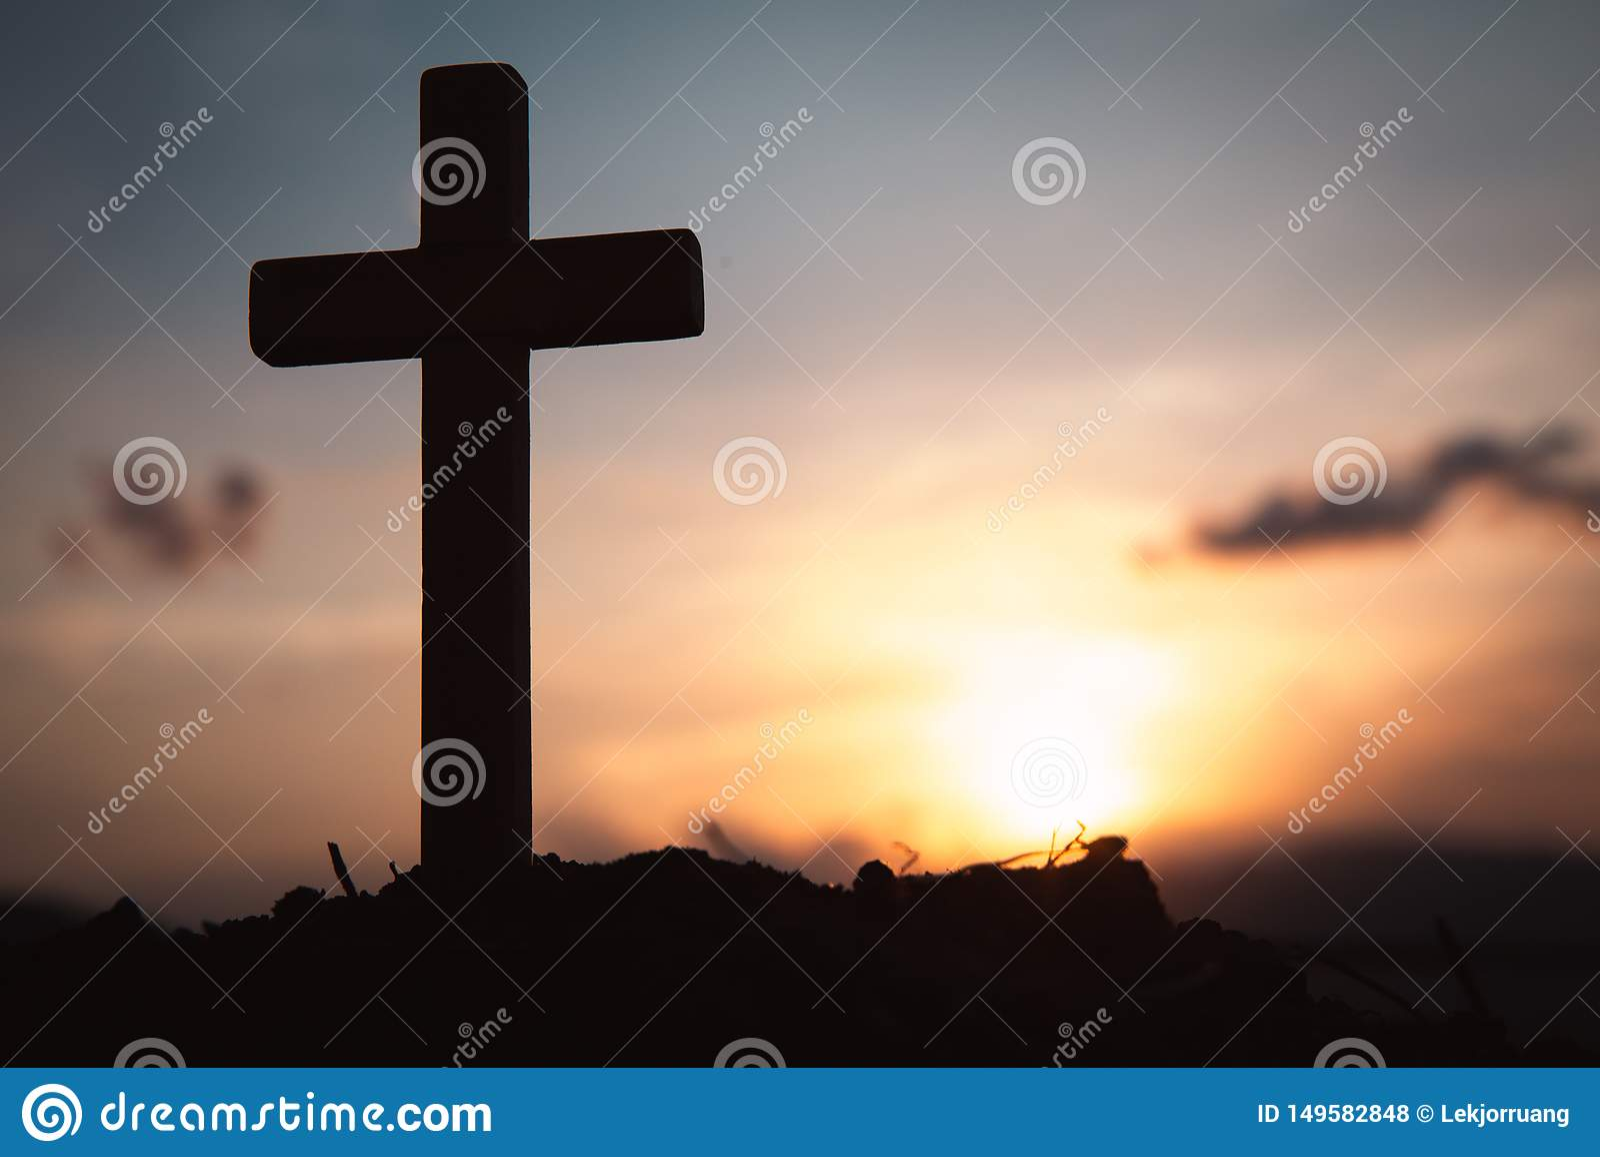 Religious Background Stock Illustrations, Cliparts And Royalty Free  Religious Background Vectors